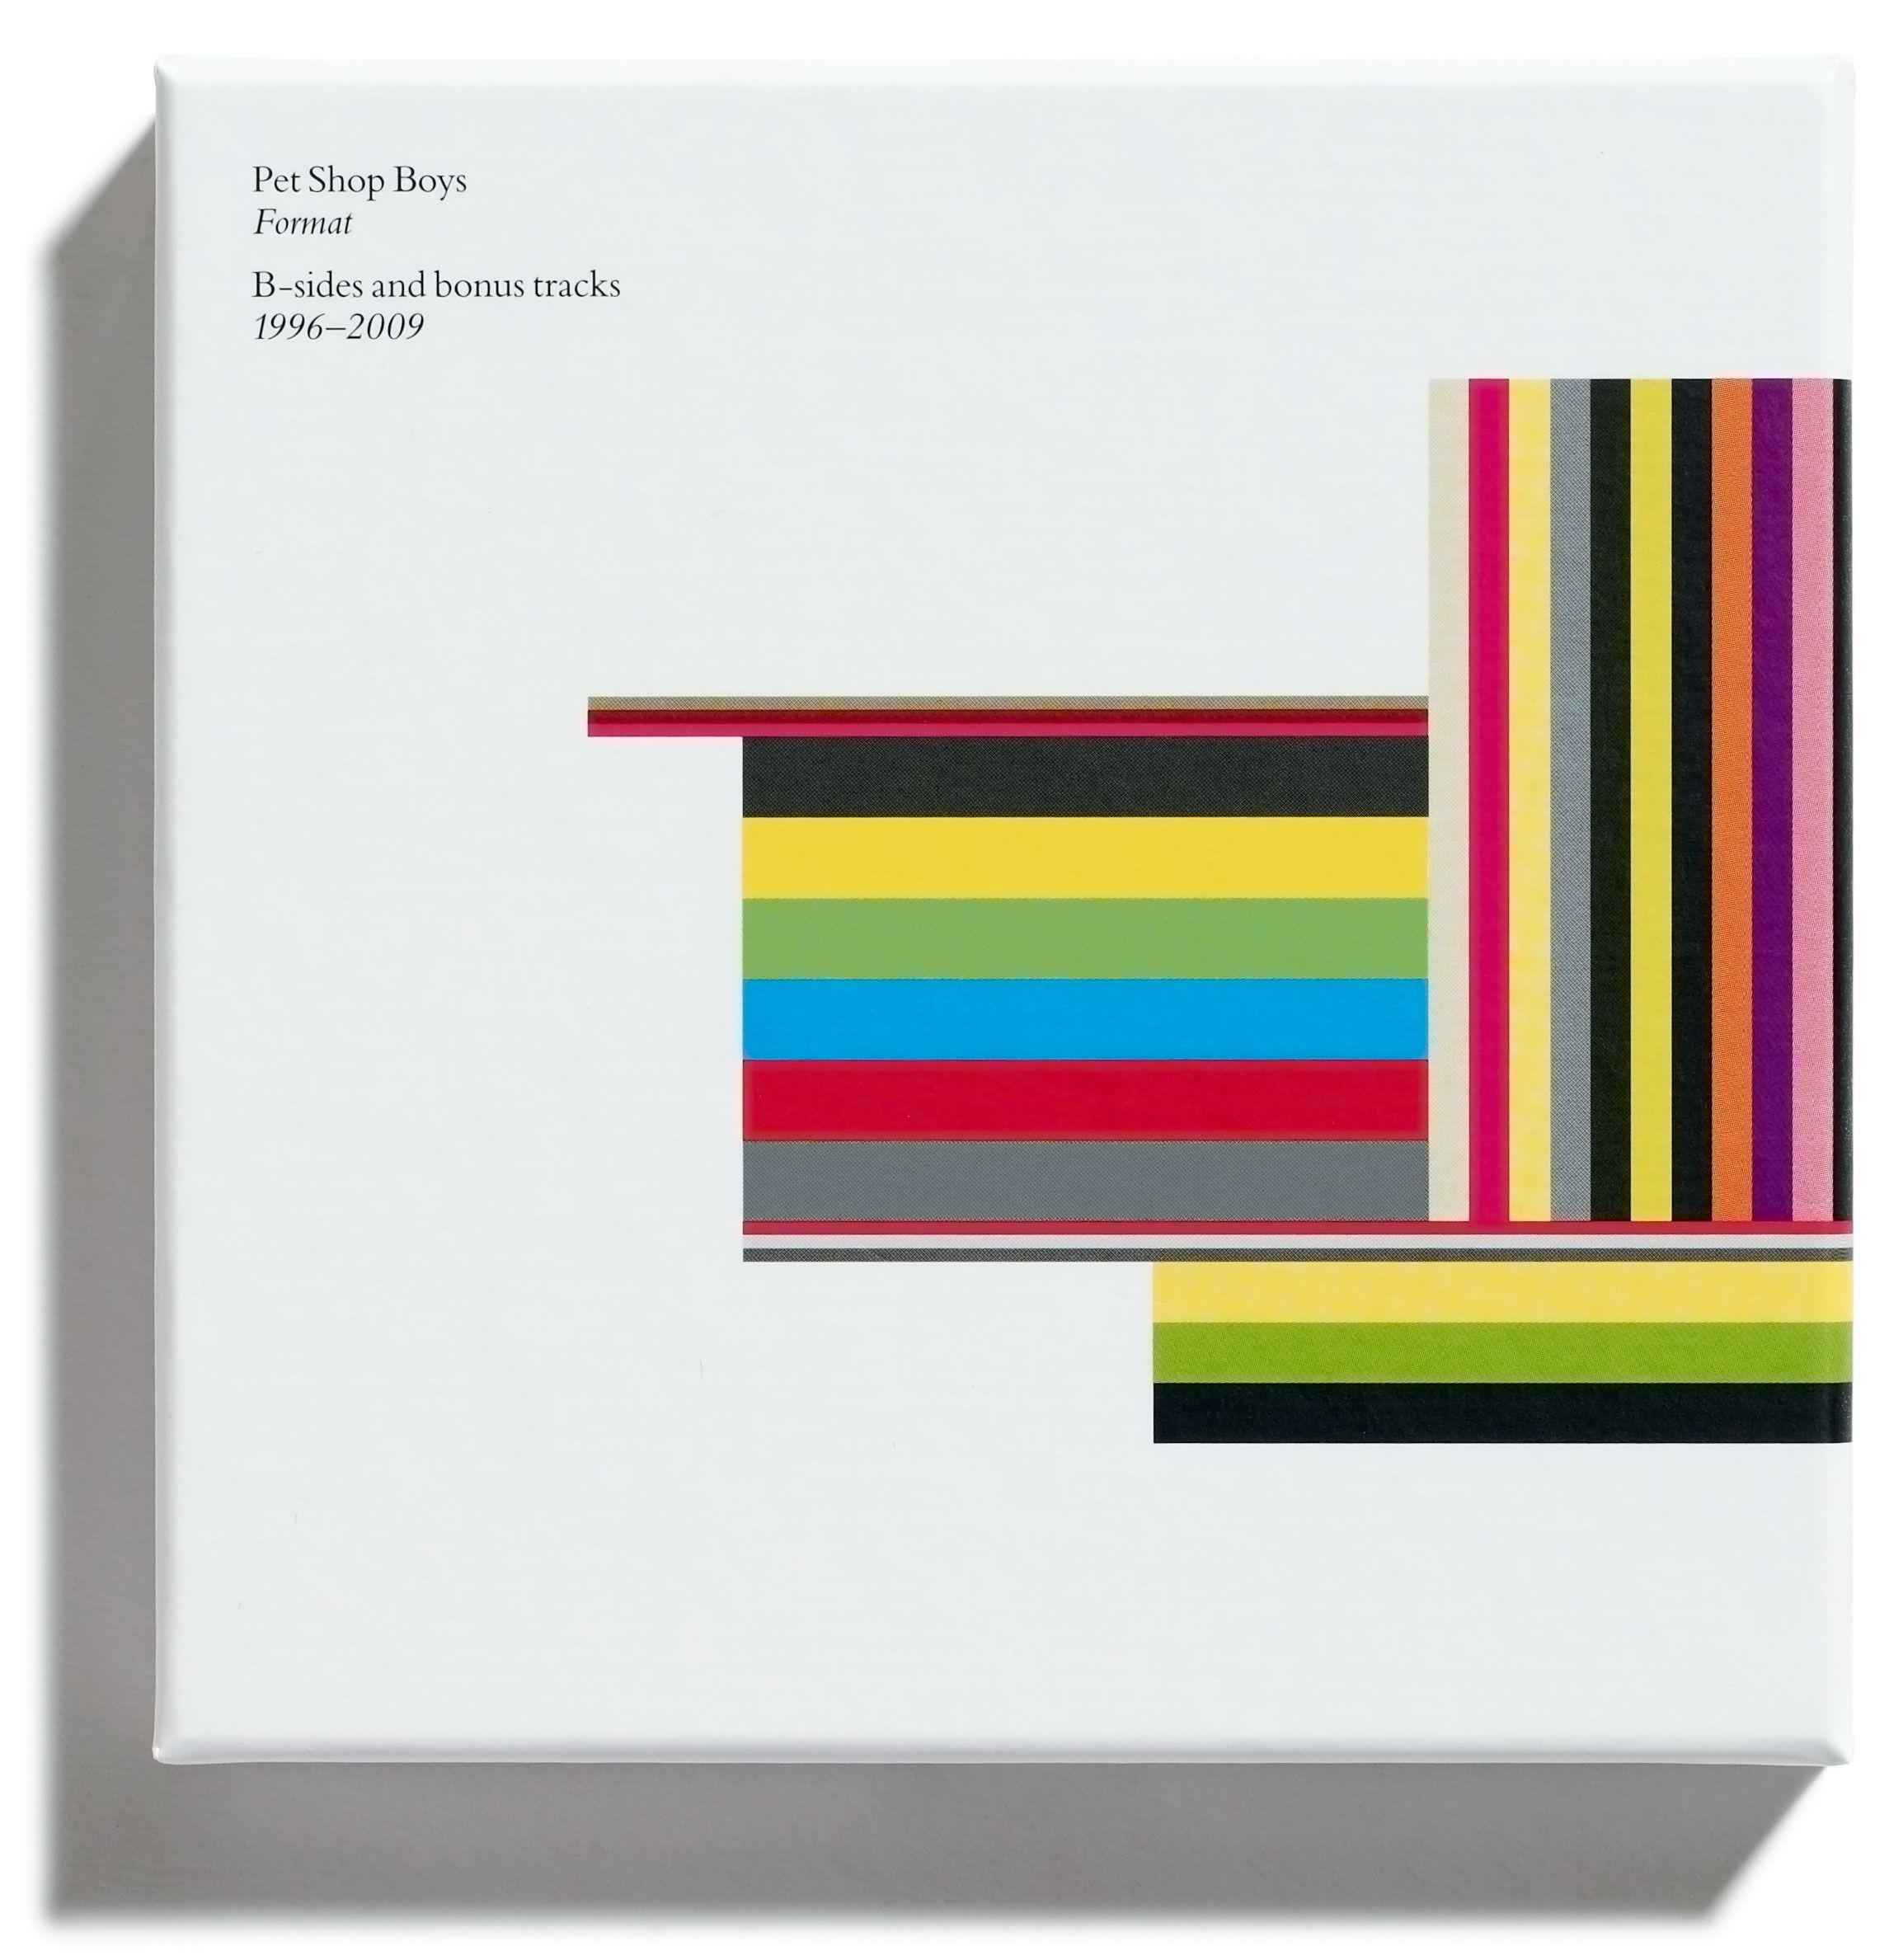 For The Record Monotype Pet Shop Boys Album Design Minimal Patterns